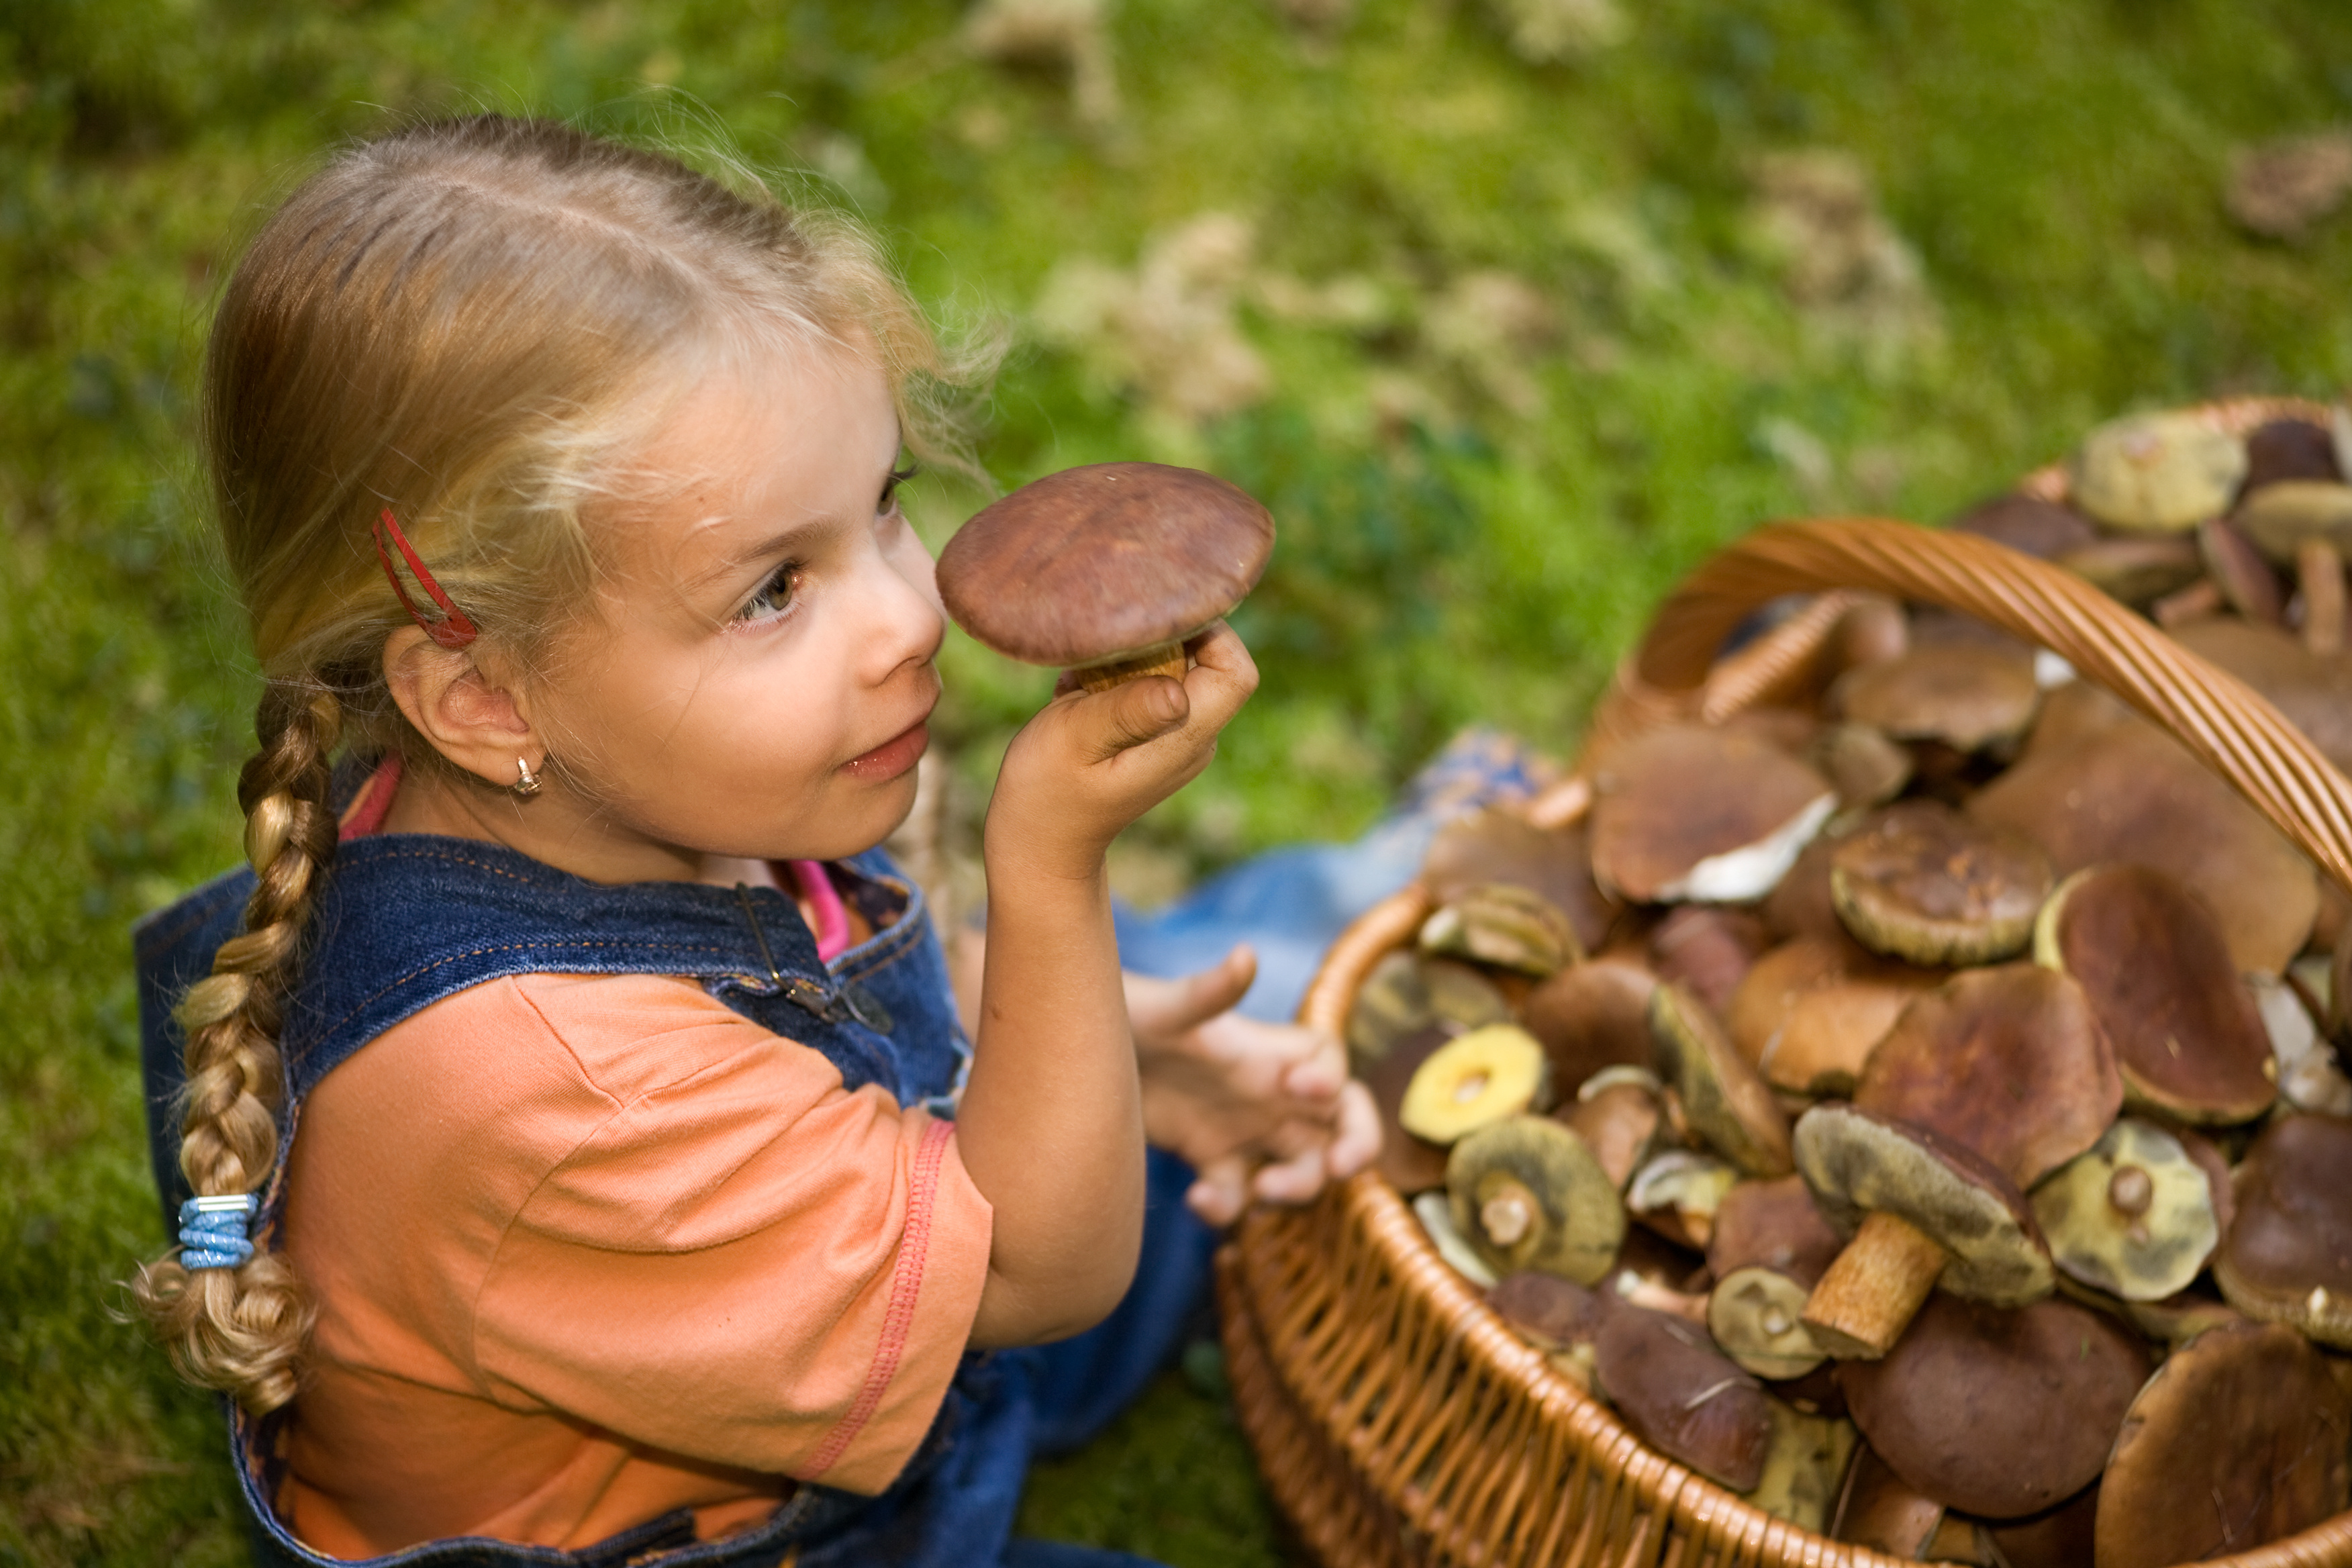 Картинка дети и грибы